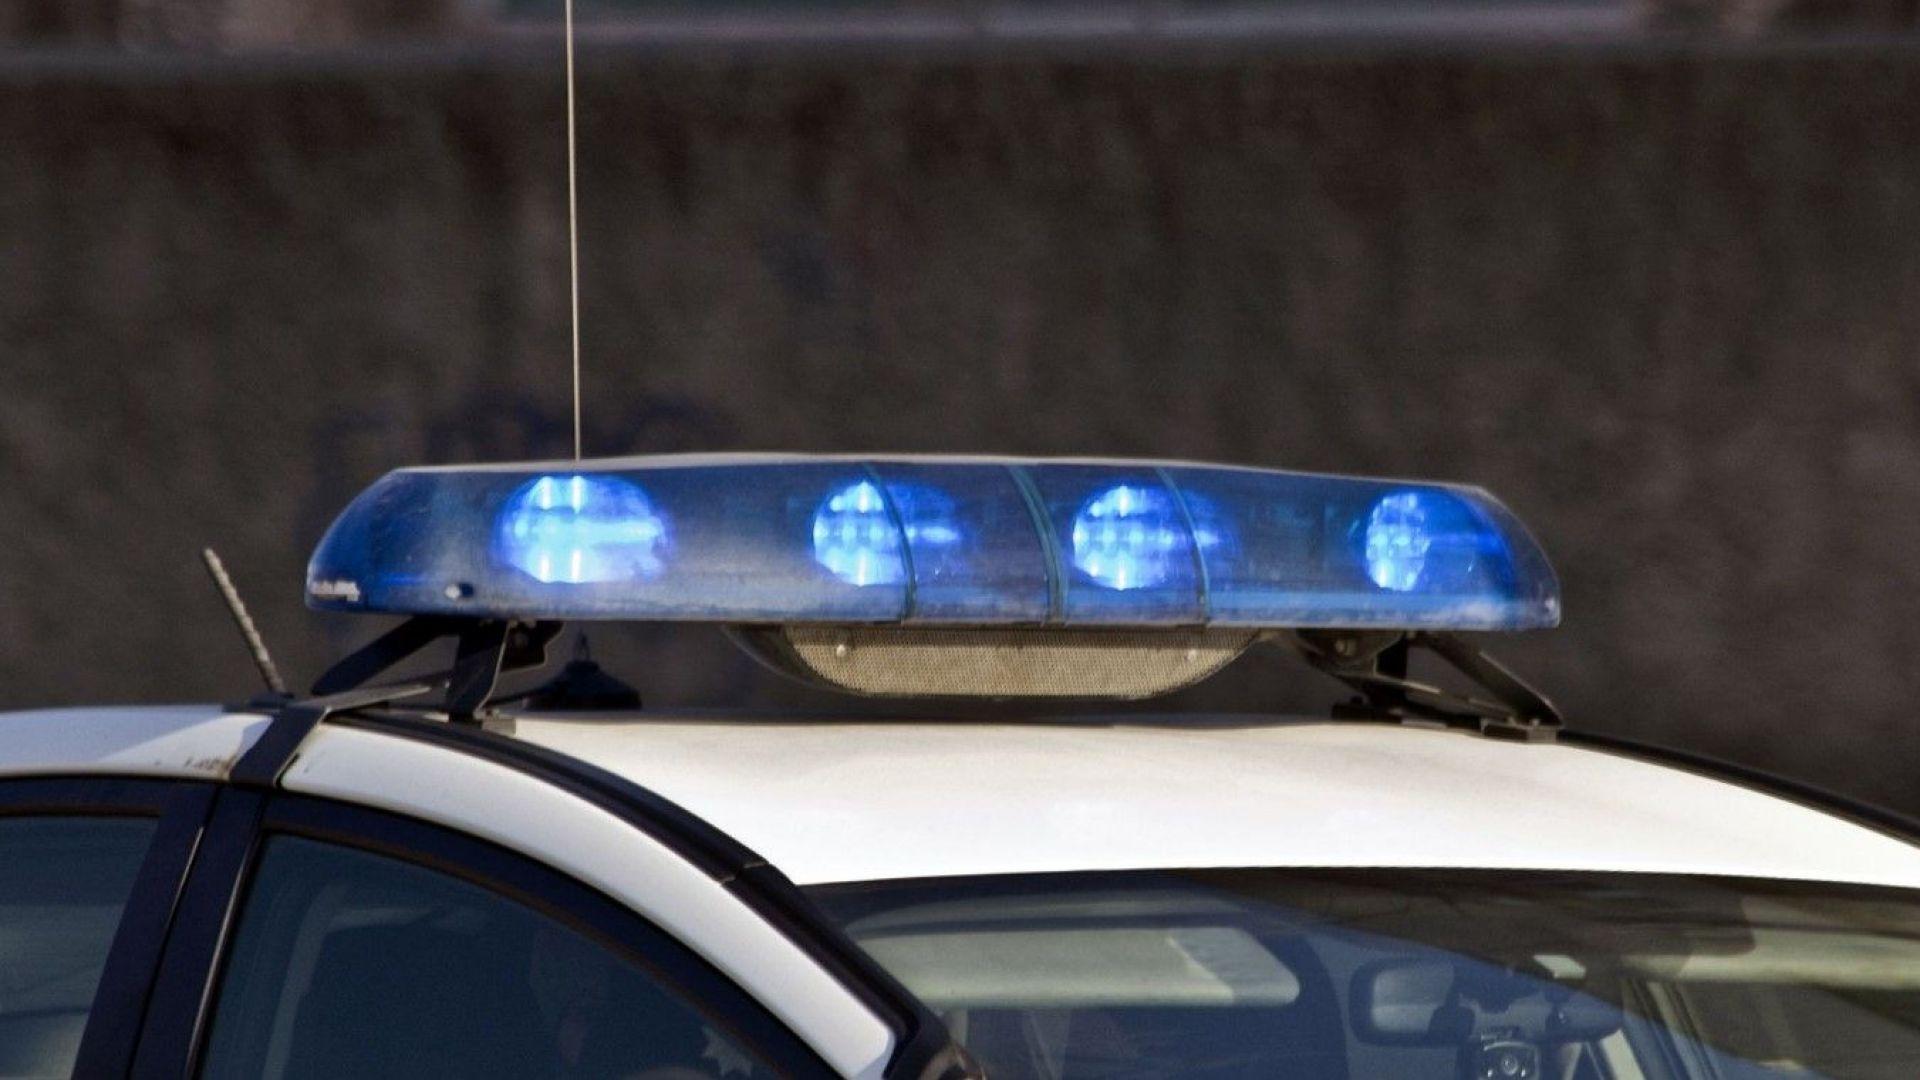 26-годишен моторист загина в тунел на пловдивски булевард